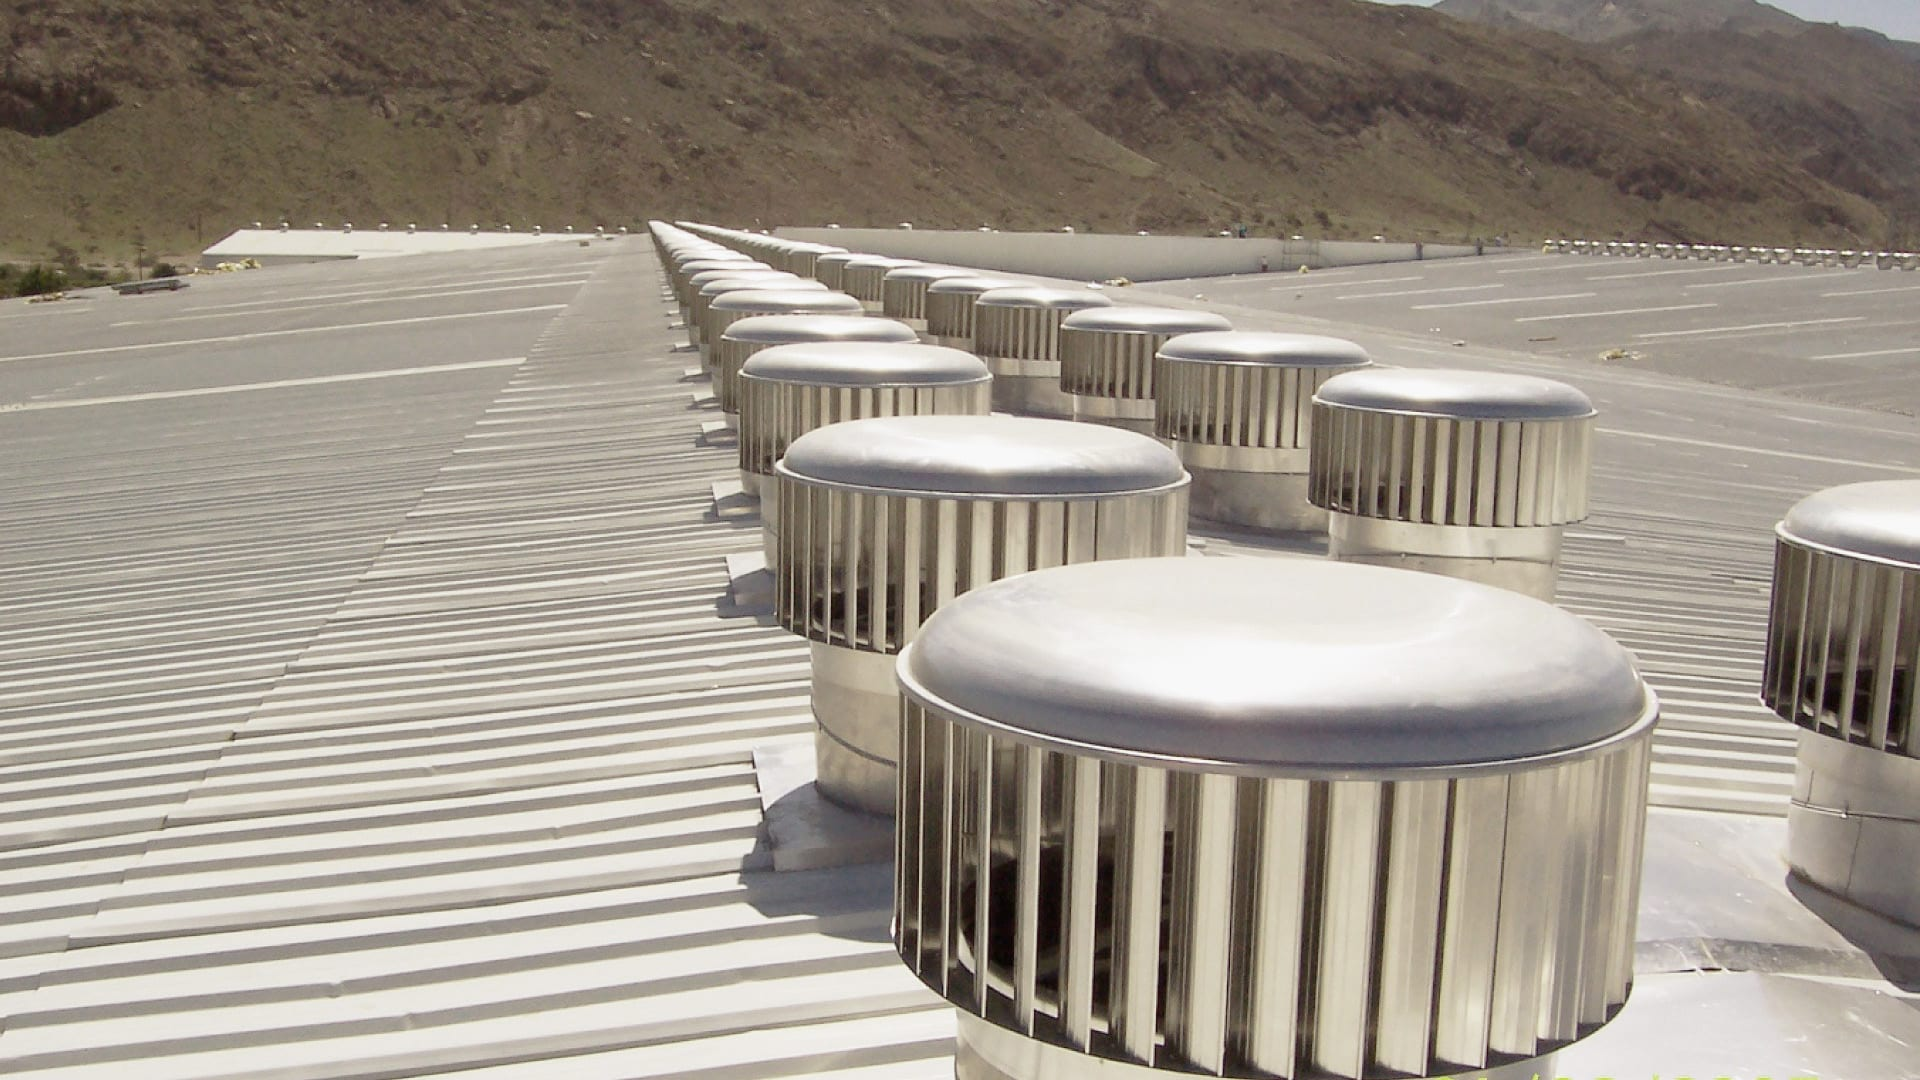 Commercial Roof Ventilators Roof Vents Australia Roof